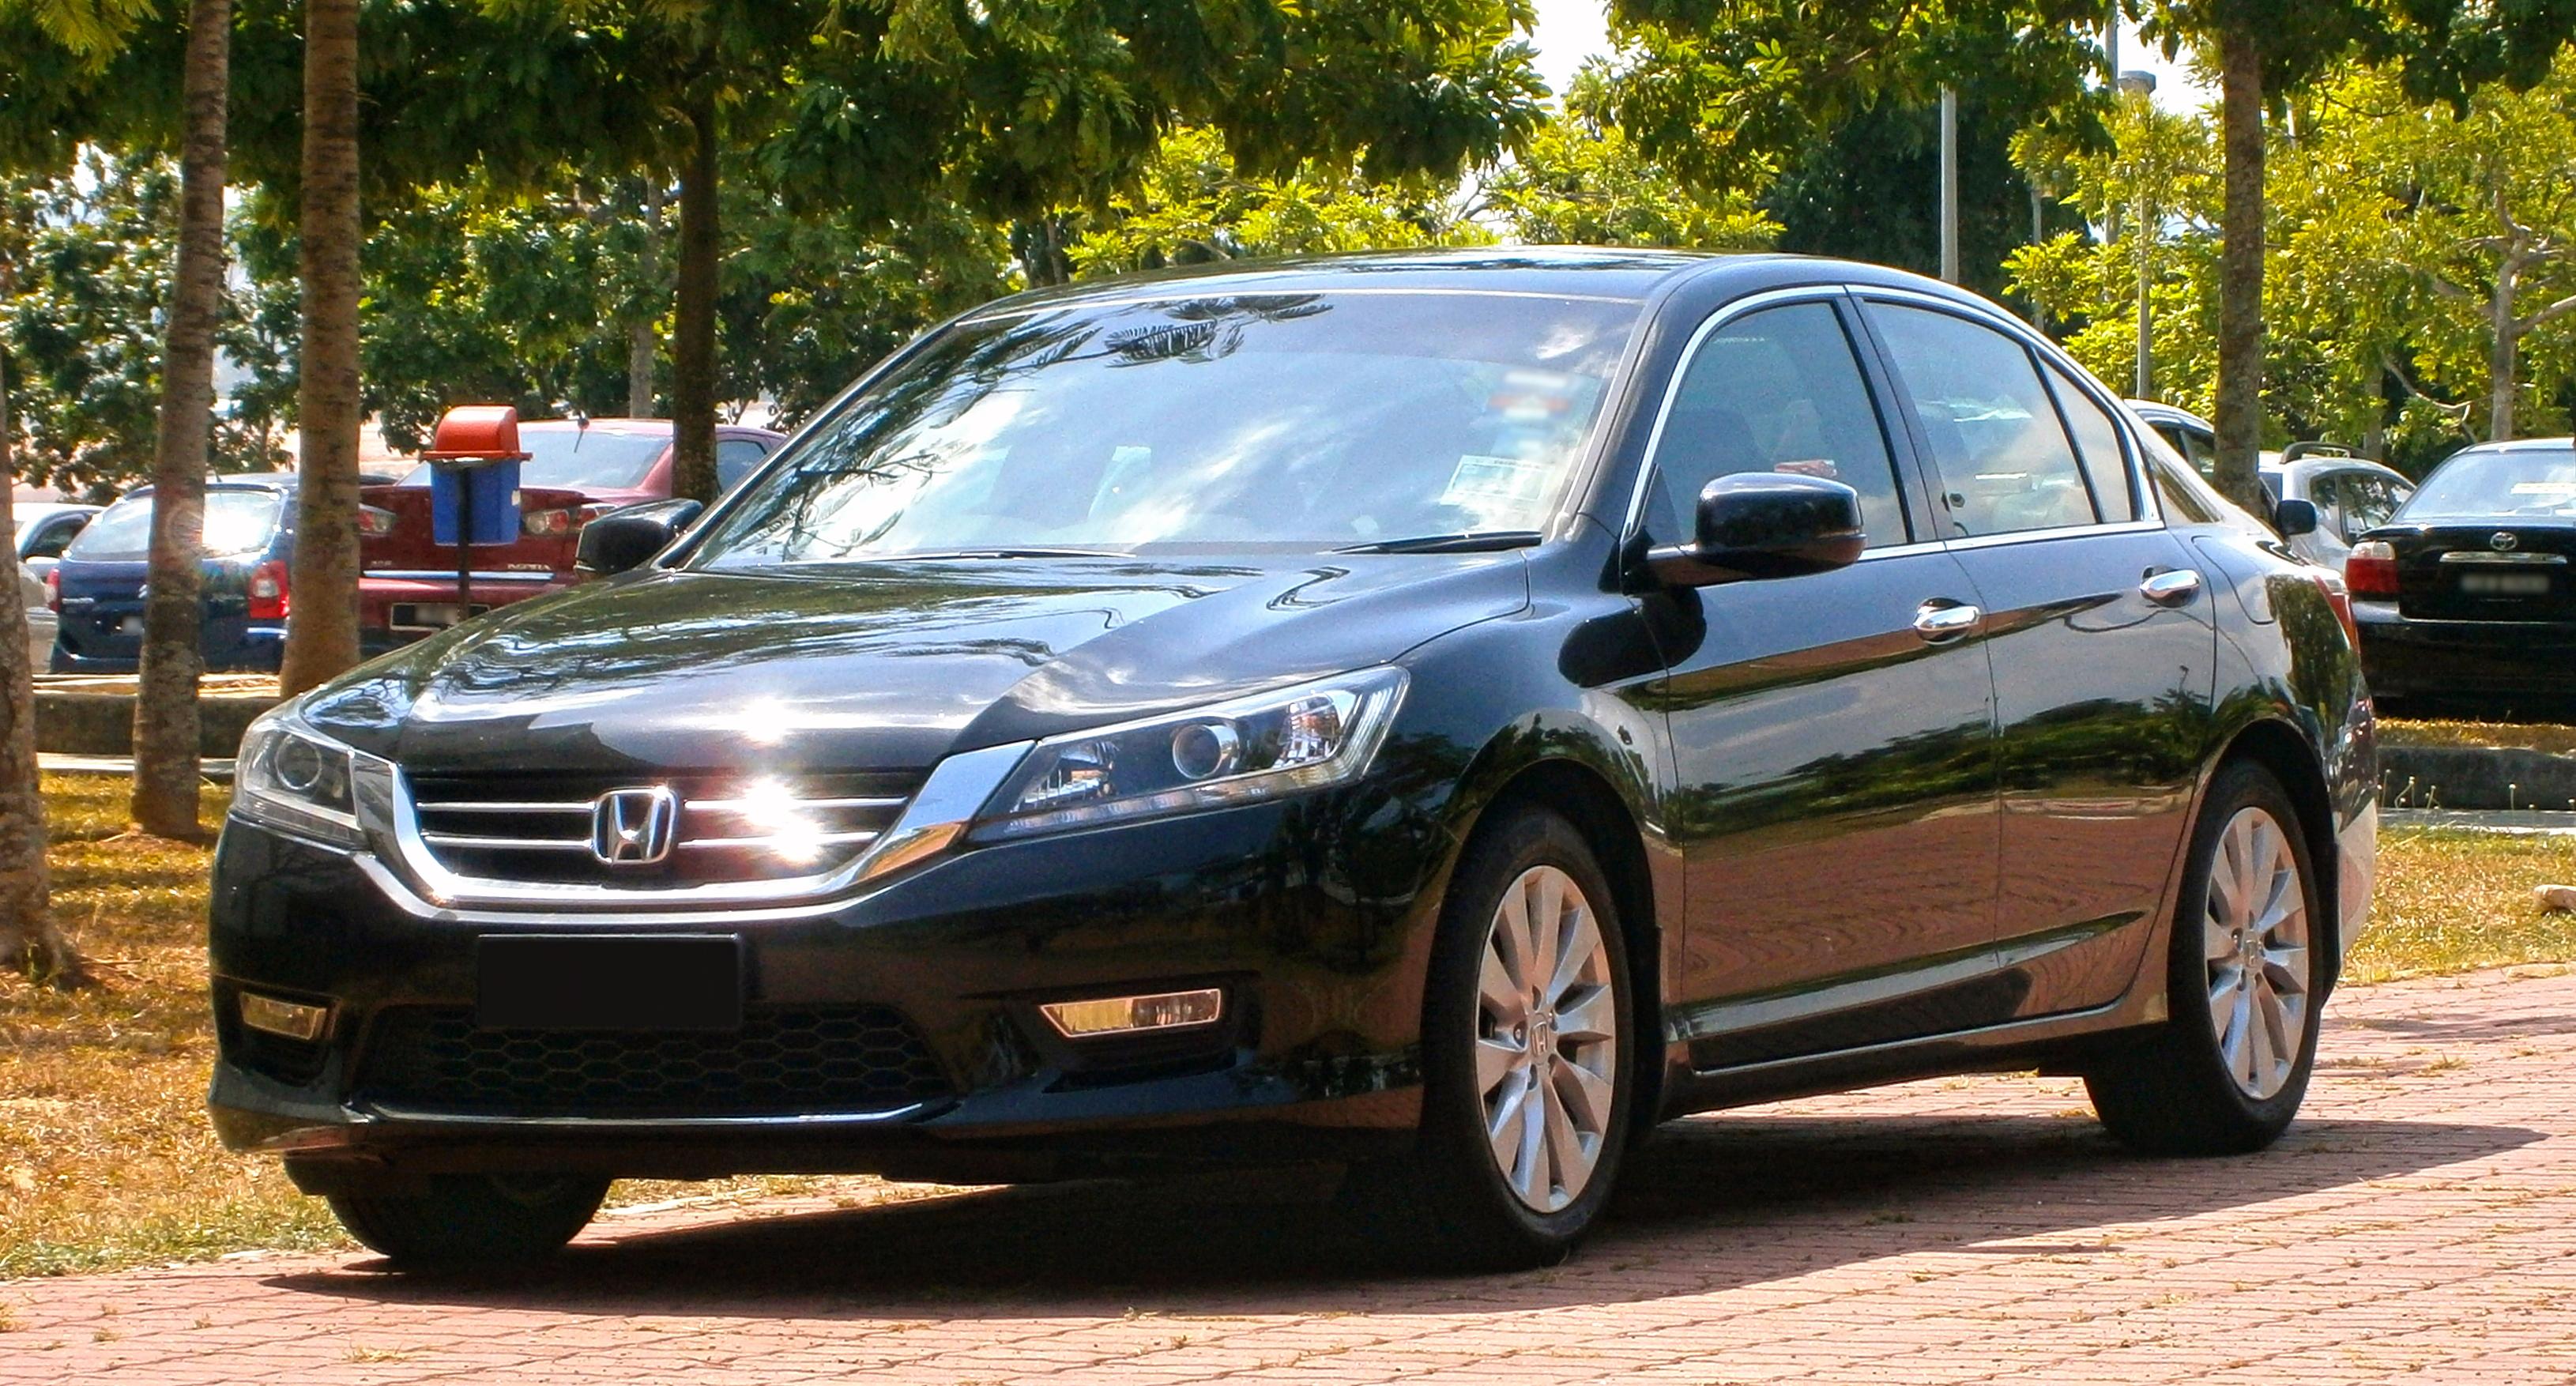 File2014 Honda Accord 20 VTi L In Cyberjaya Malaysia 01